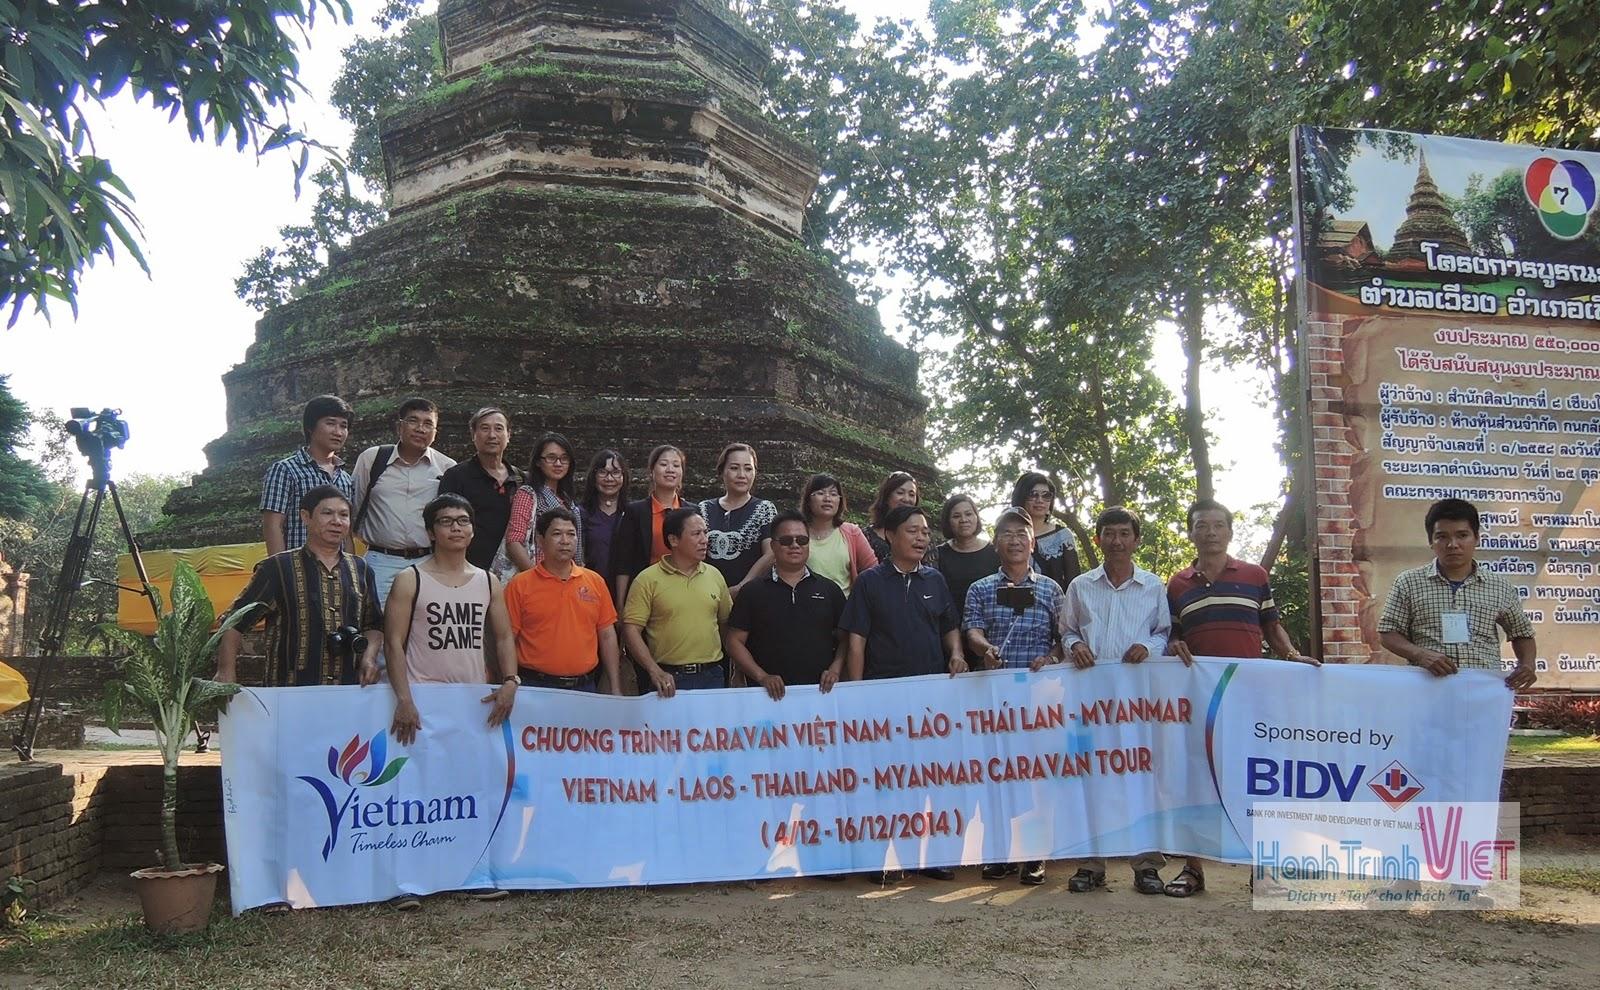 Khảo sát tour Caravan Vietnam - Lao - Thai - Myanmar 2014